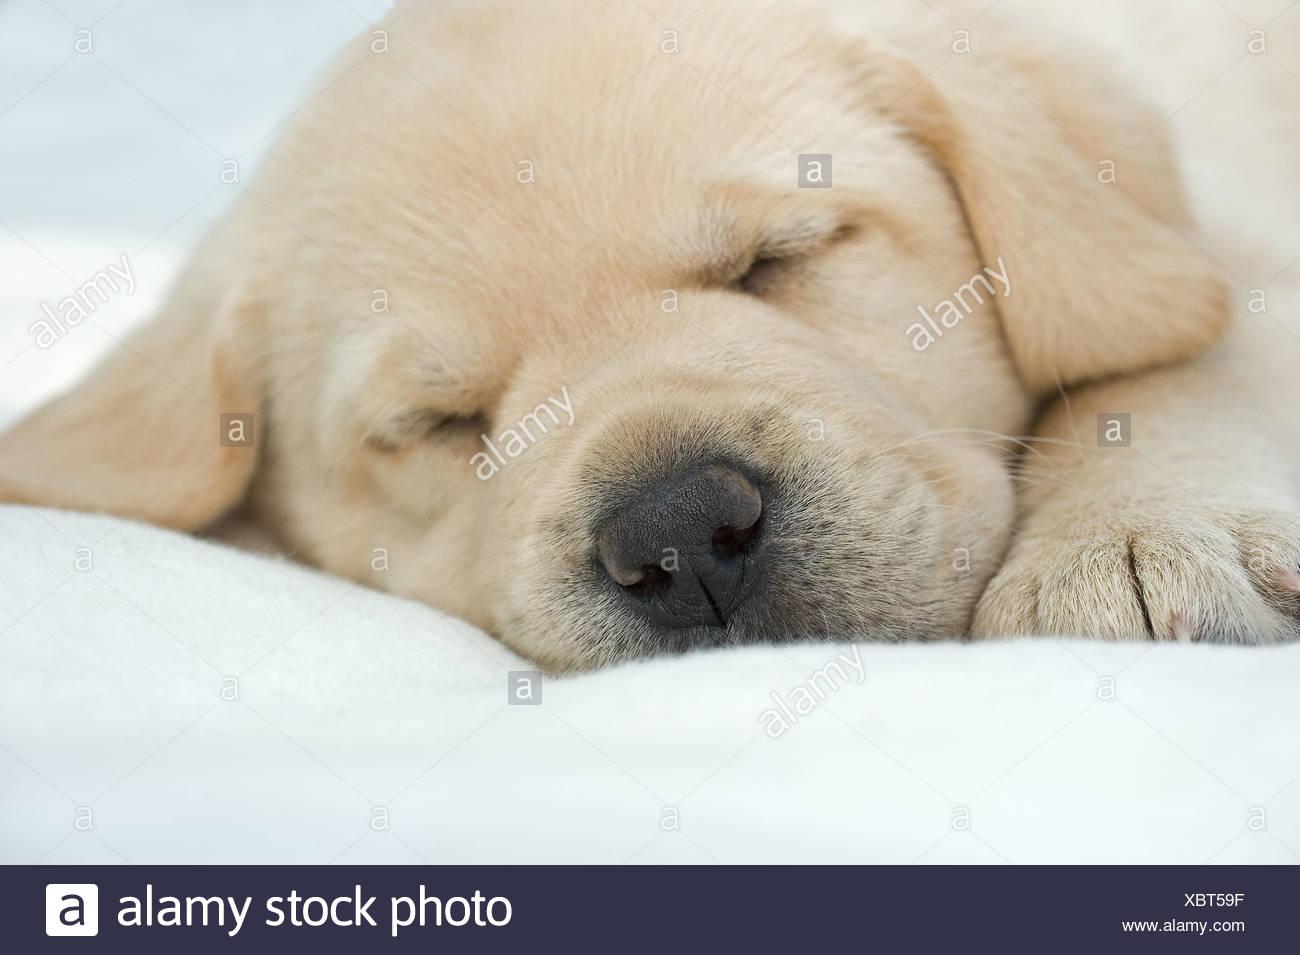 Labrador Retriever dog - puppy - sleeping - Stock Image